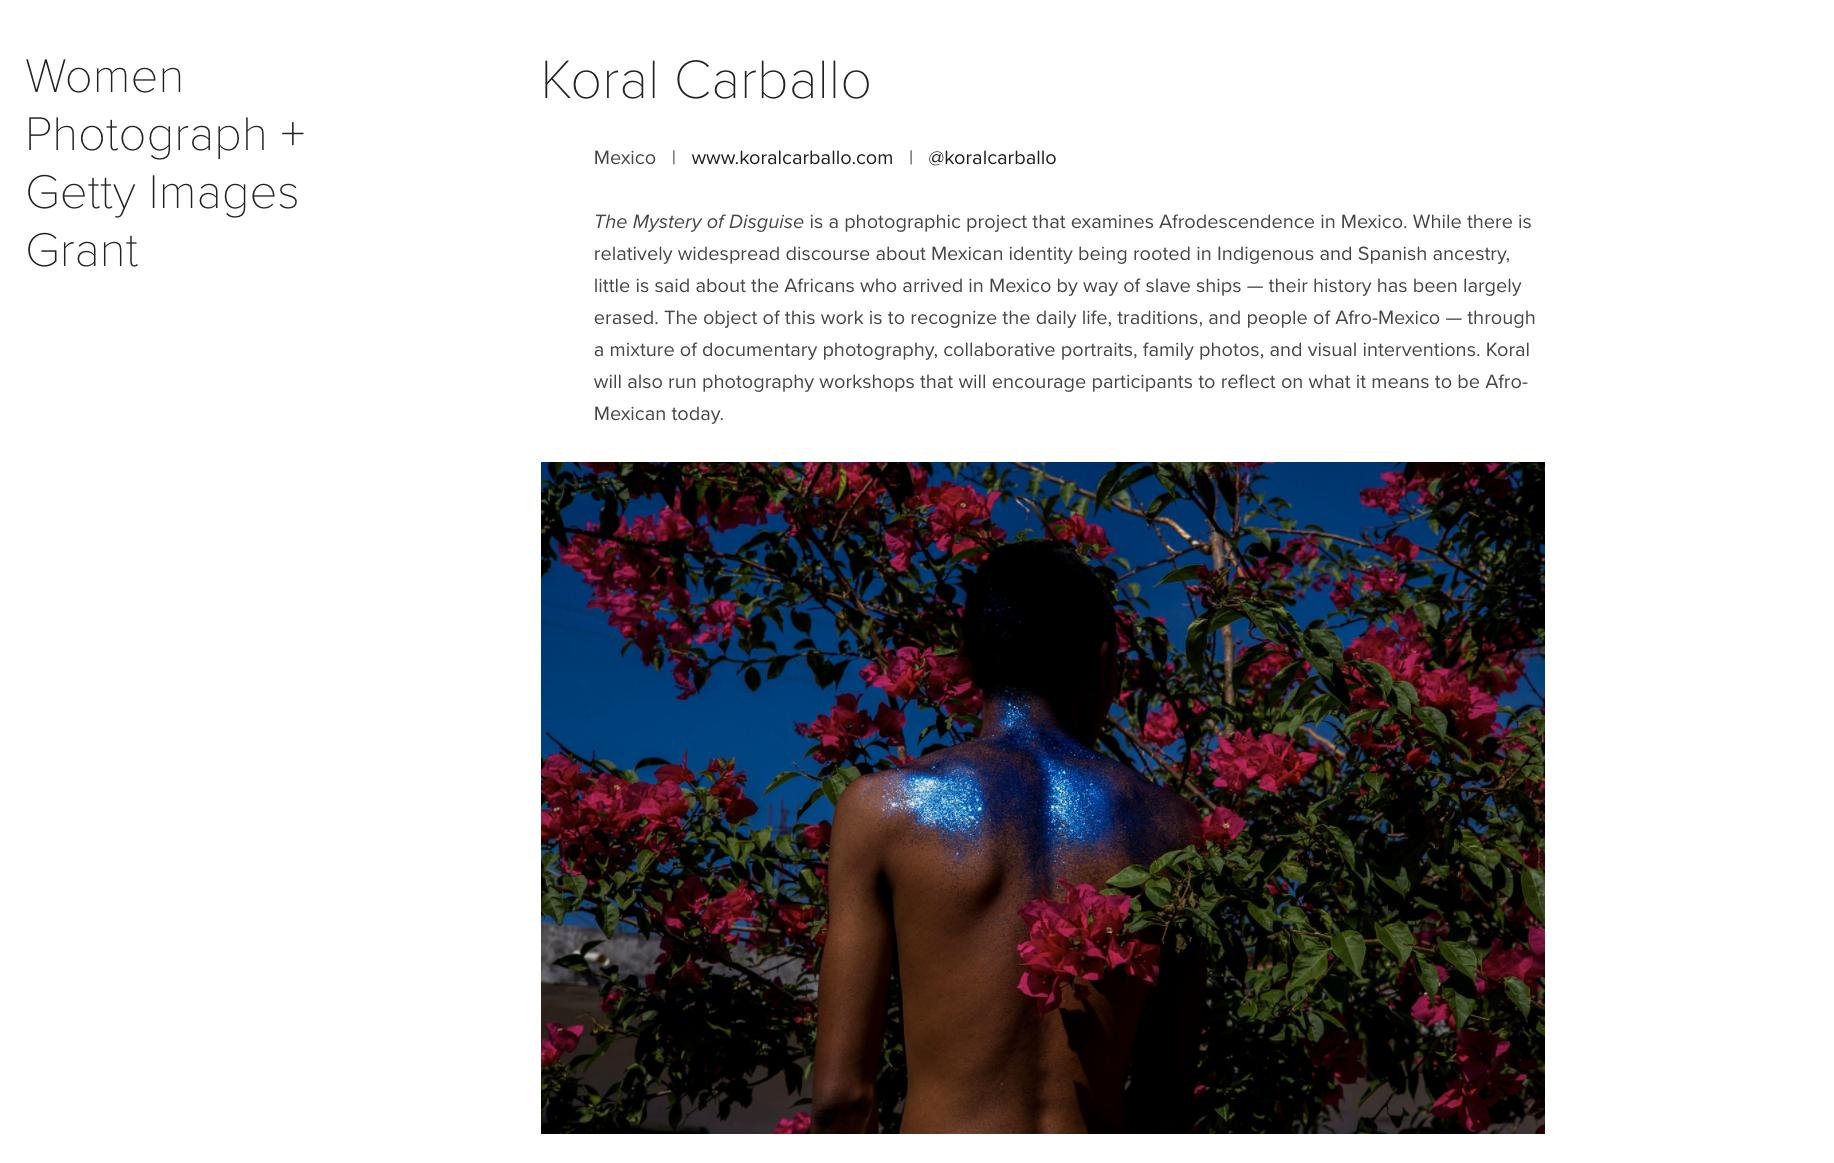 Art and Documentary Photography - Loading Captura_de_Pantalla_2020-08-17_a_la(s)_14.21.04.png